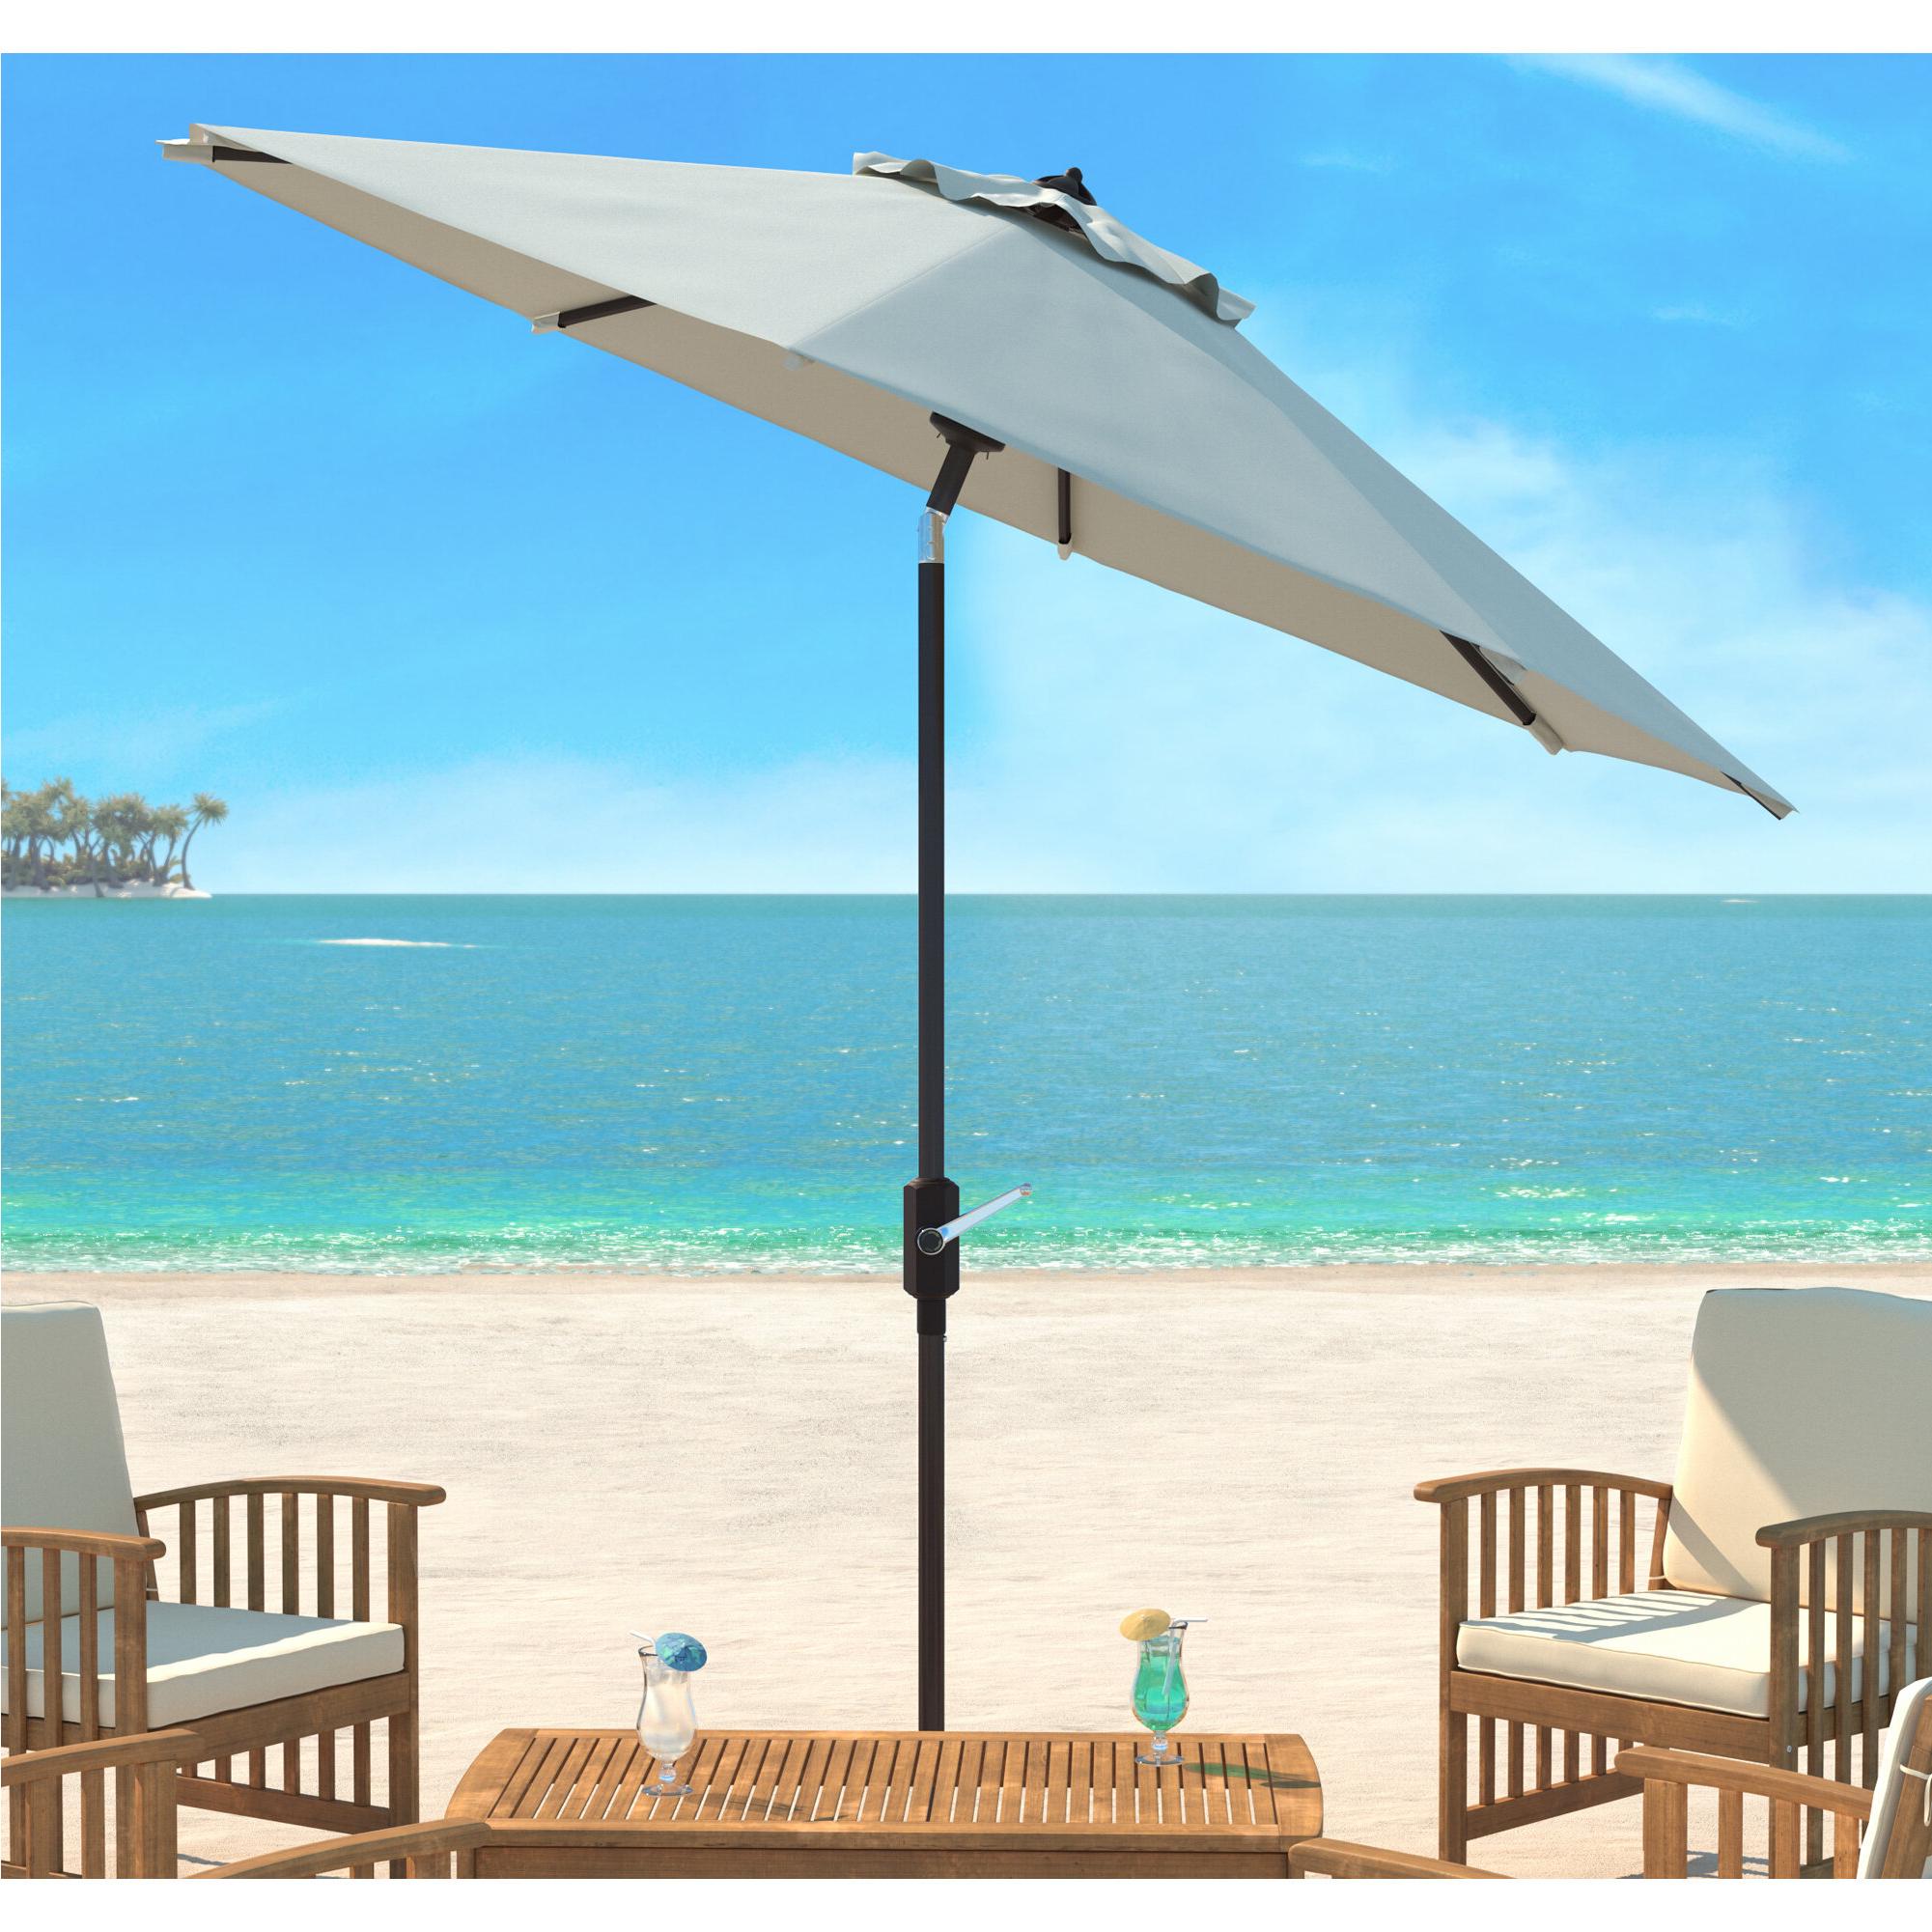 Belles 9 Market Umbrella Regarding Recent Markley Market Beach Umbrellas (View 3 of 20)